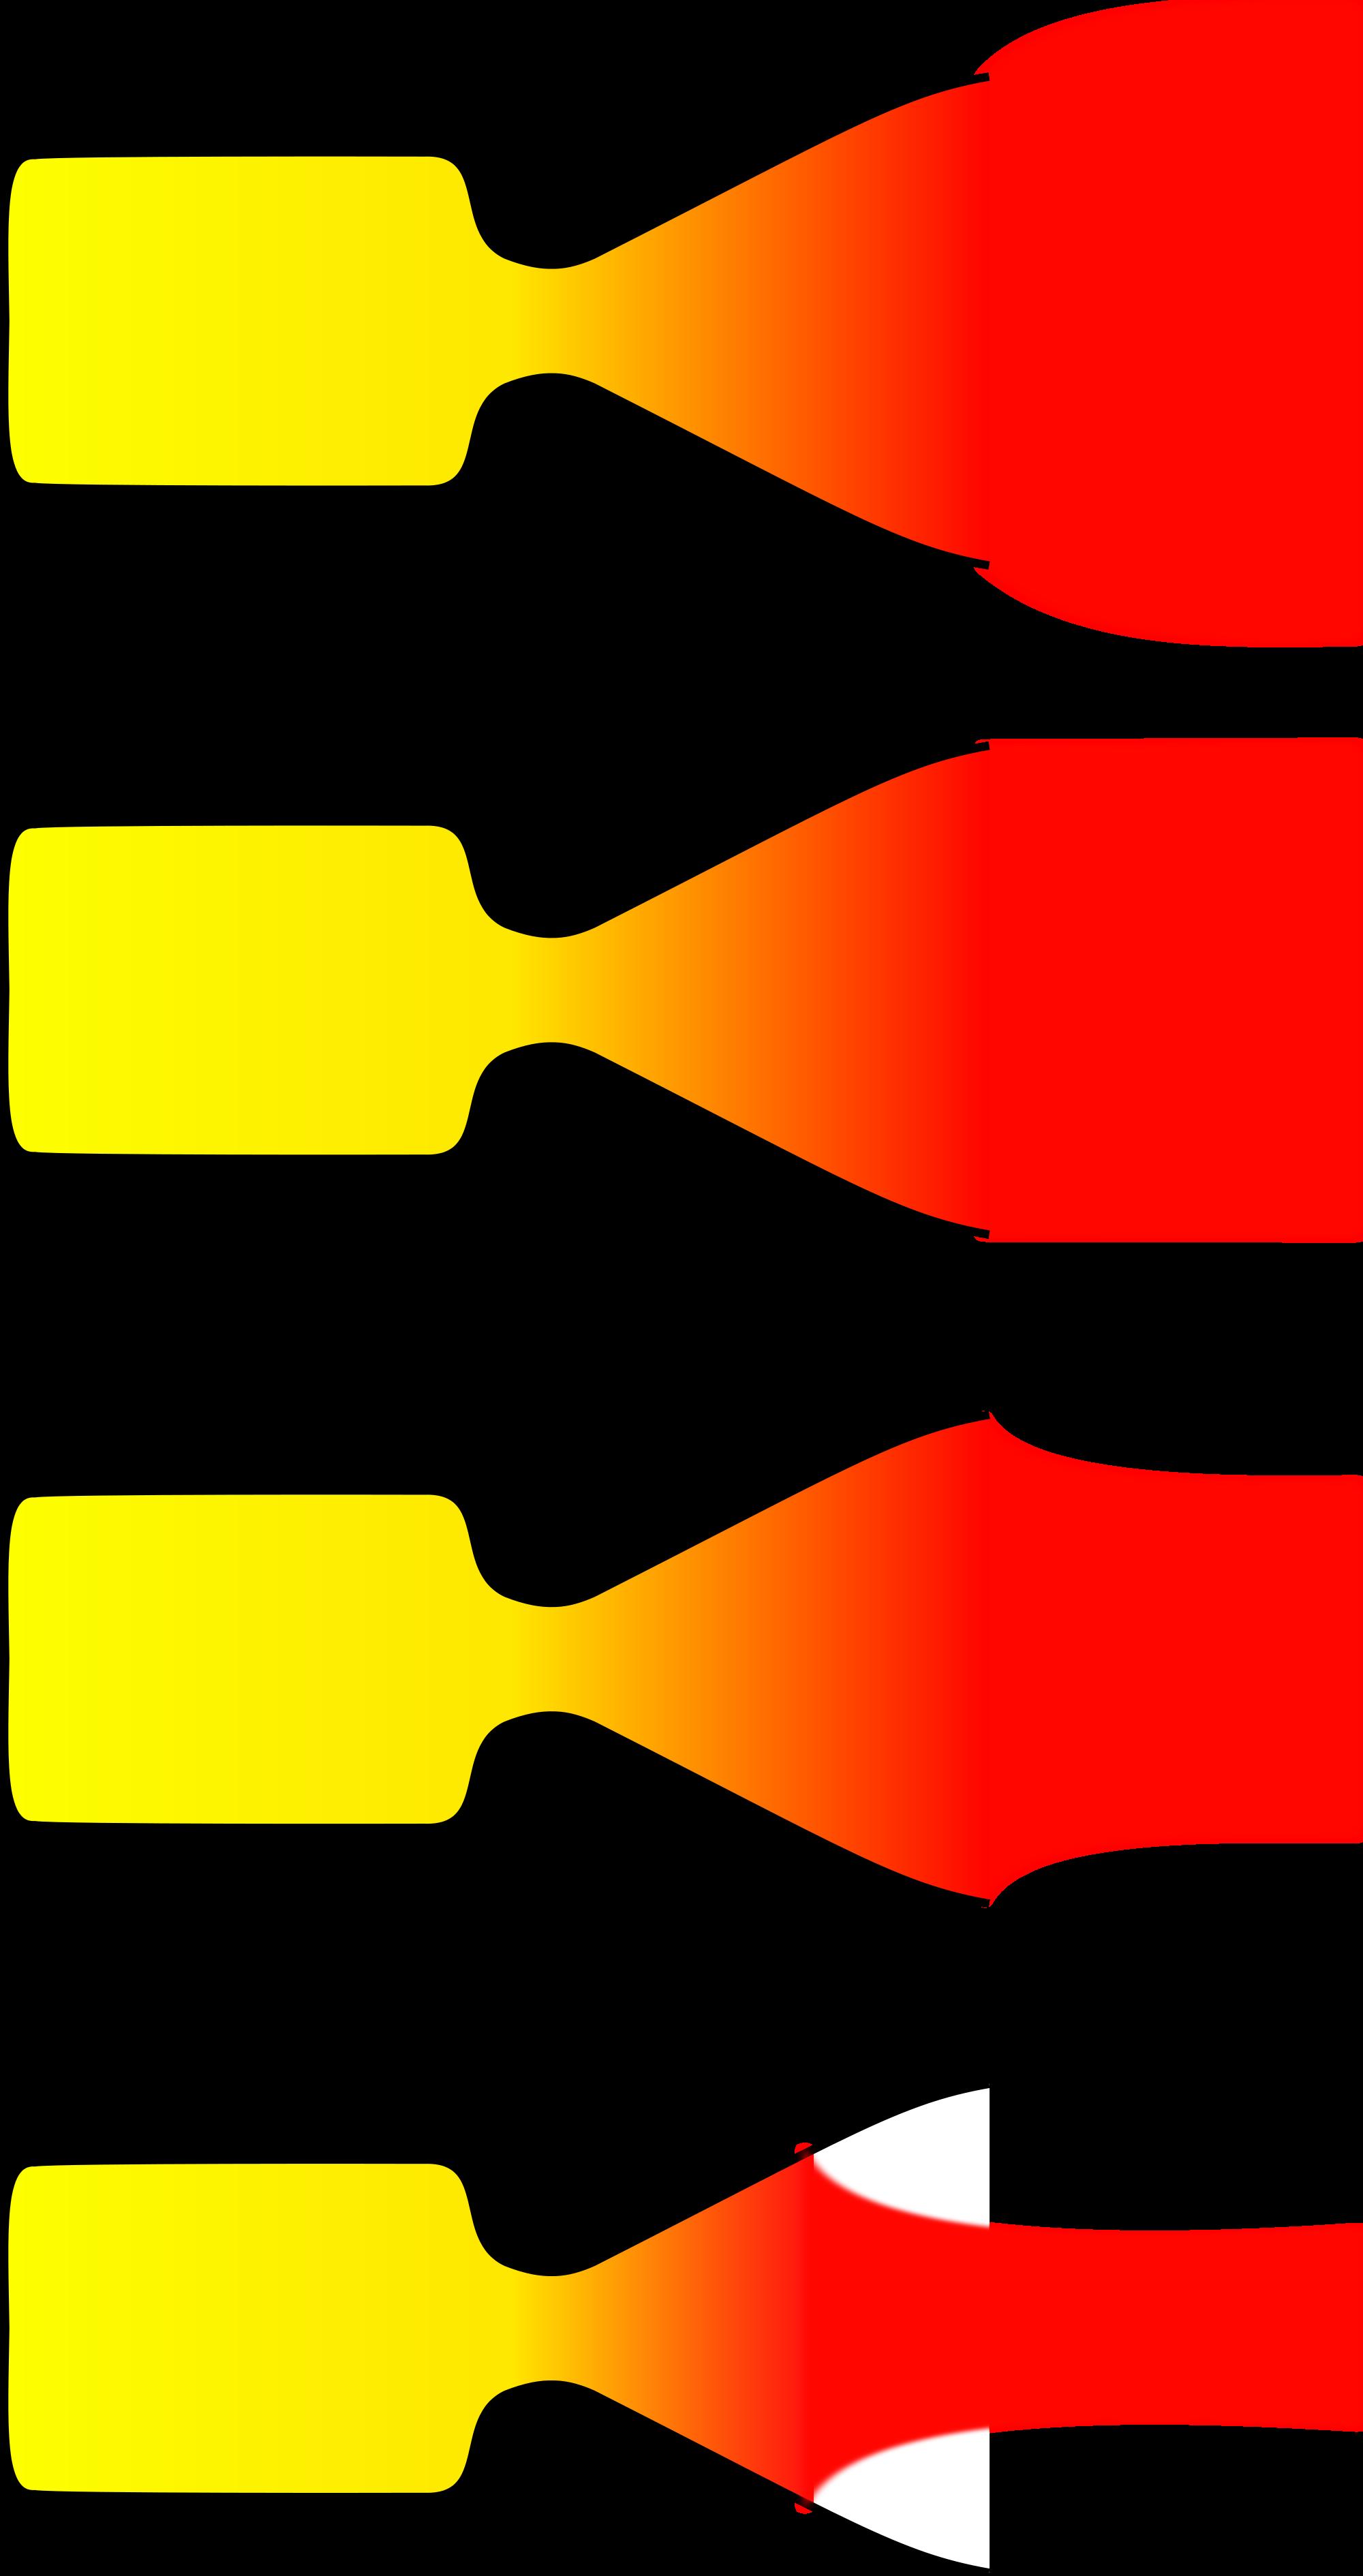 Clipart rocket rocket engine. File nozzle expansion svg